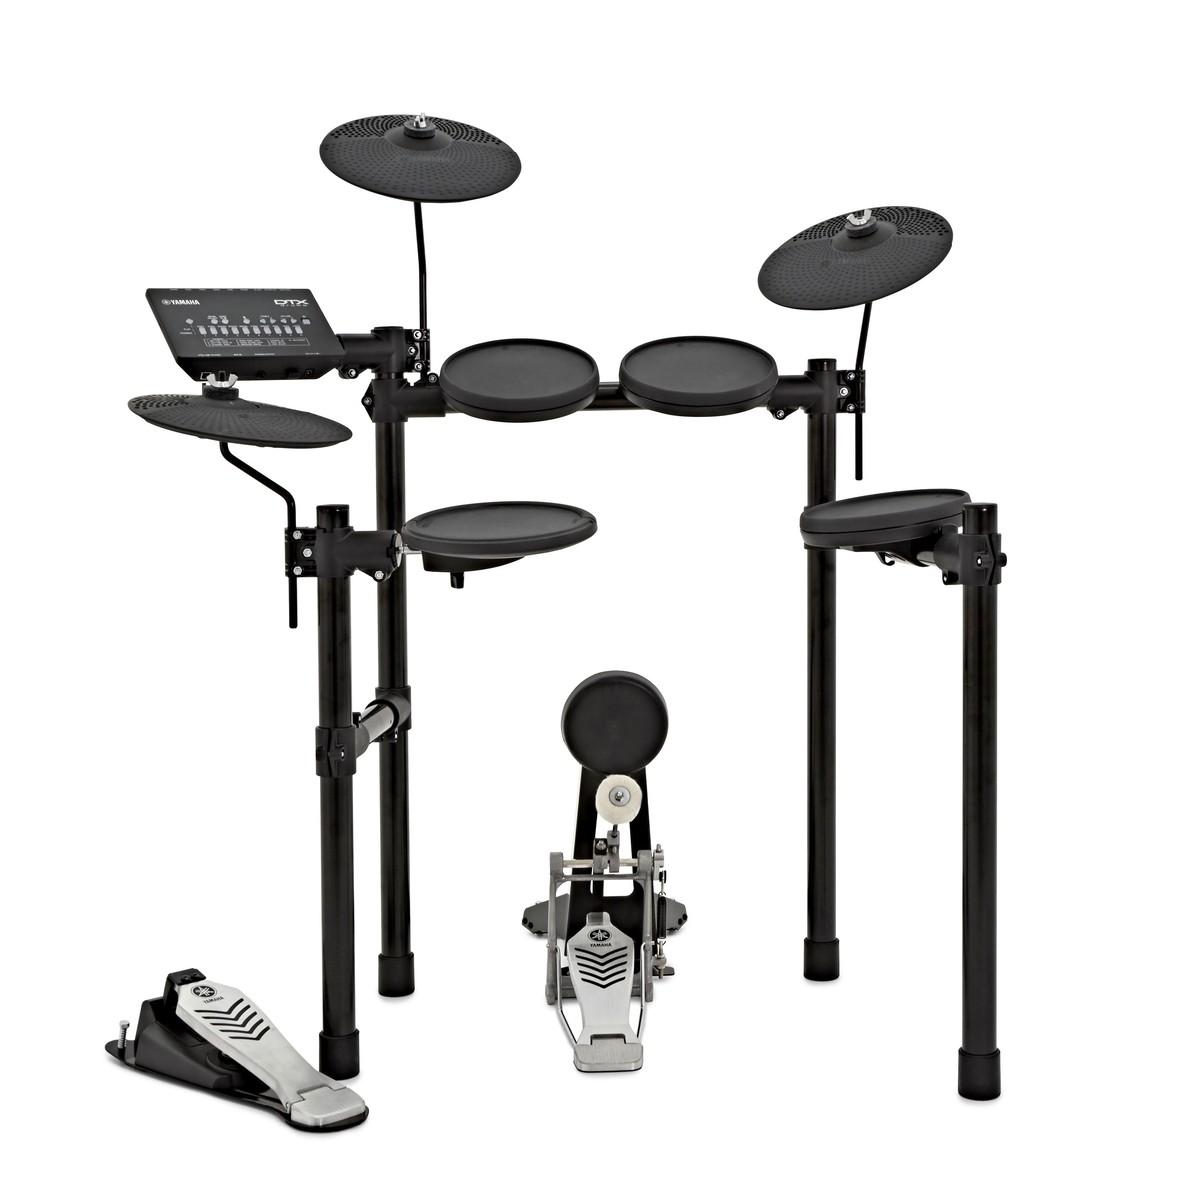 yamaha dtx452 electronic drum kit at gear4music. Black Bedroom Furniture Sets. Home Design Ideas